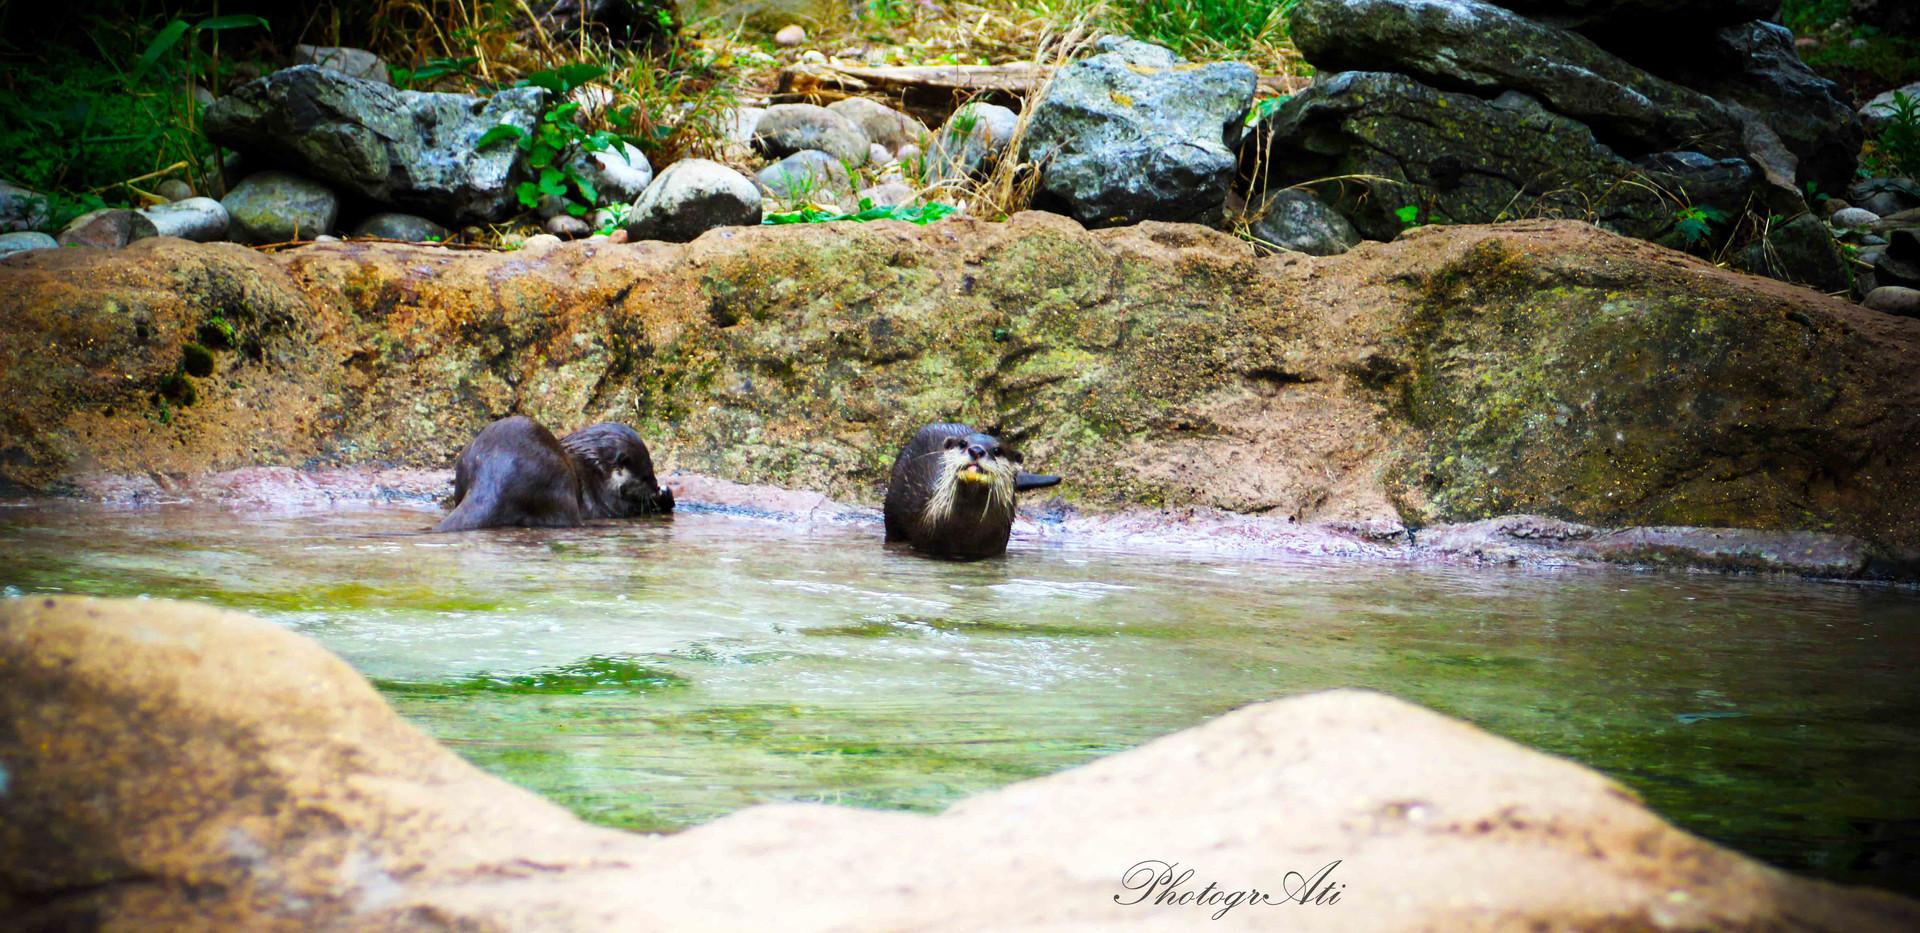 Oriental small-clawed otters - Pip and Matilda blury-preloadresized-preloadHanuman Langur Monkey  Oriental small-clawed otters - Pip and Matilda